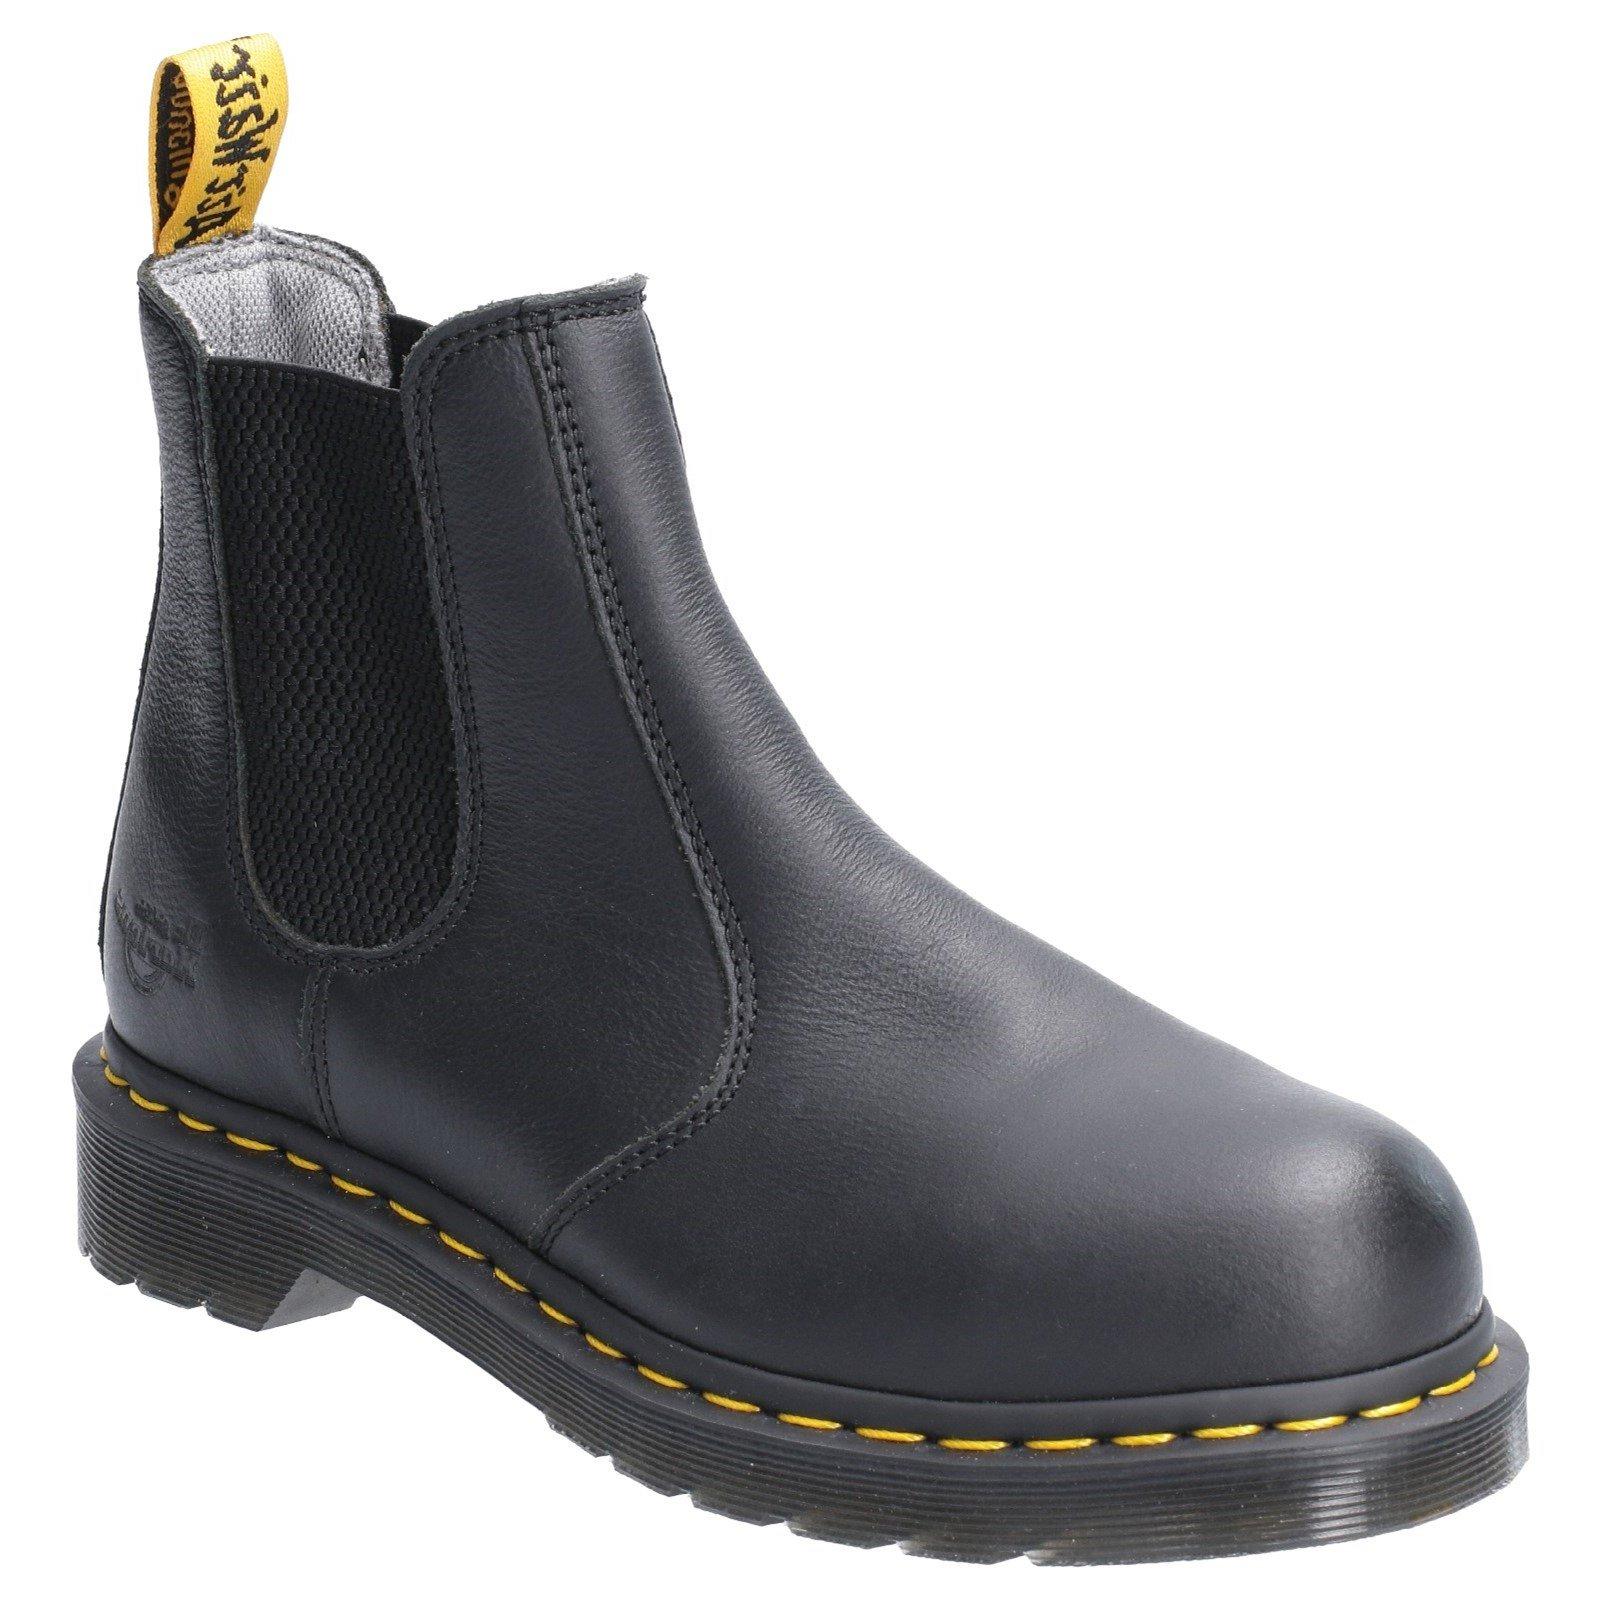 Dr Martens Women's Arbor Elastic Safety Boot Various Colours 29517 - Black 8